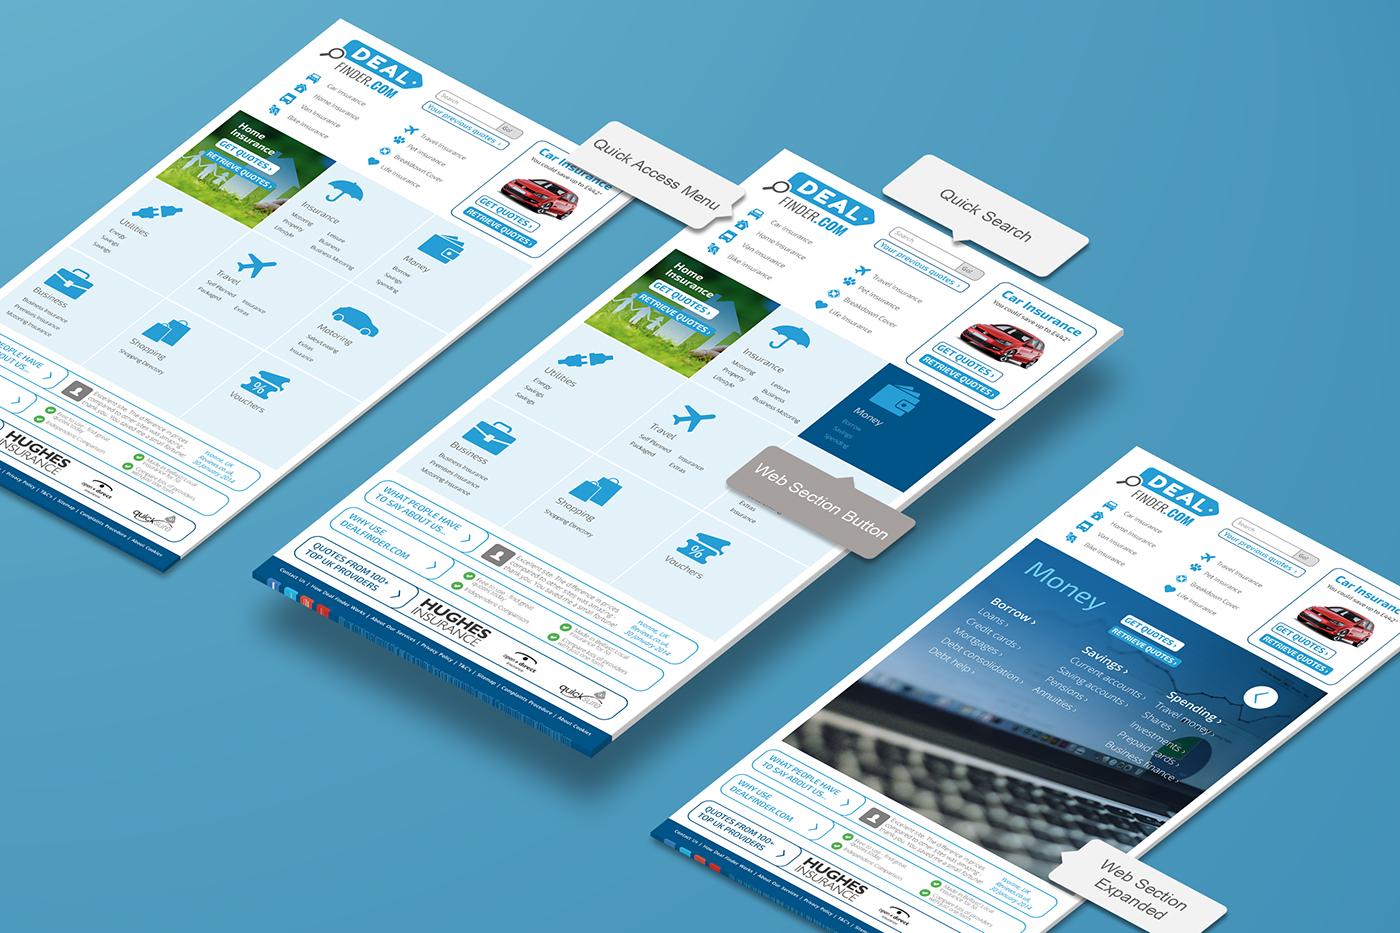 UI ux UI/UX Web Design  user interface user experience